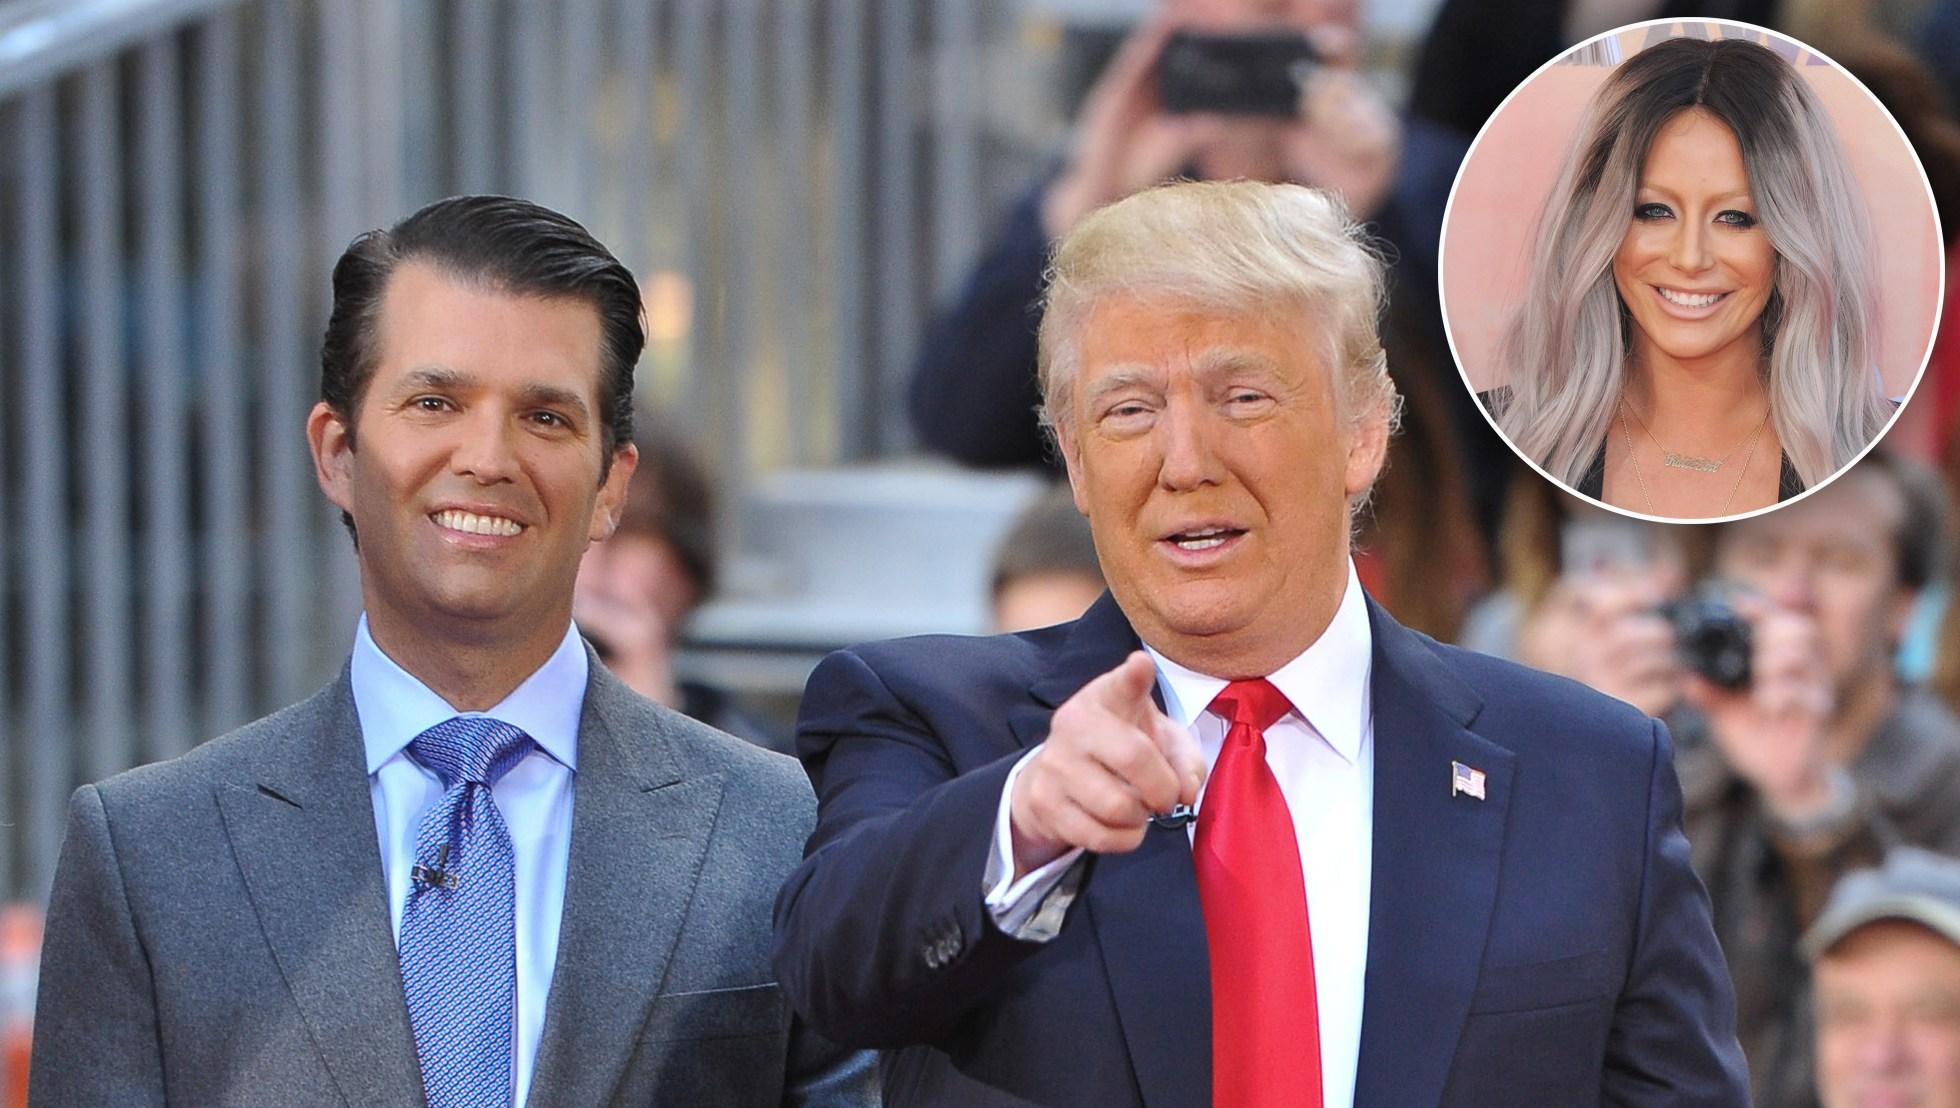 Donald Trump Jr, Donald Trump and Aubrey O'Day affair